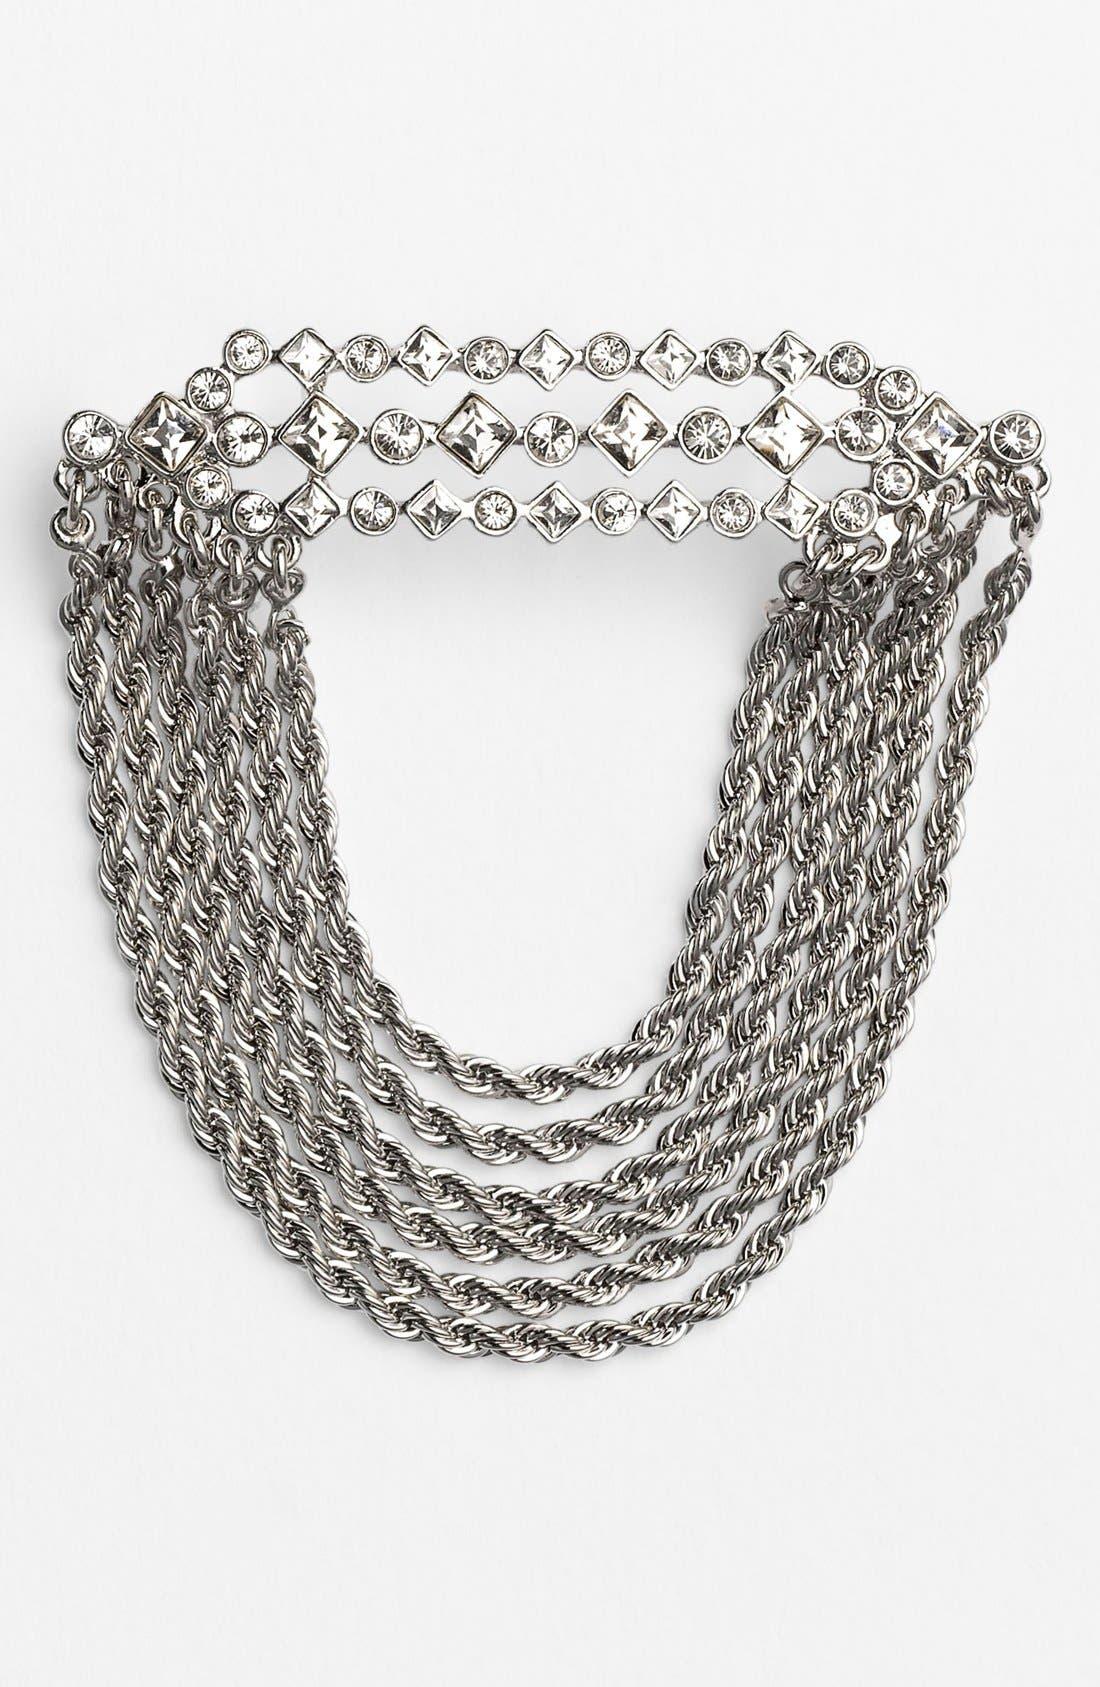 Alternate Image 1 Selected - Givenchy Link & Crystal Pin